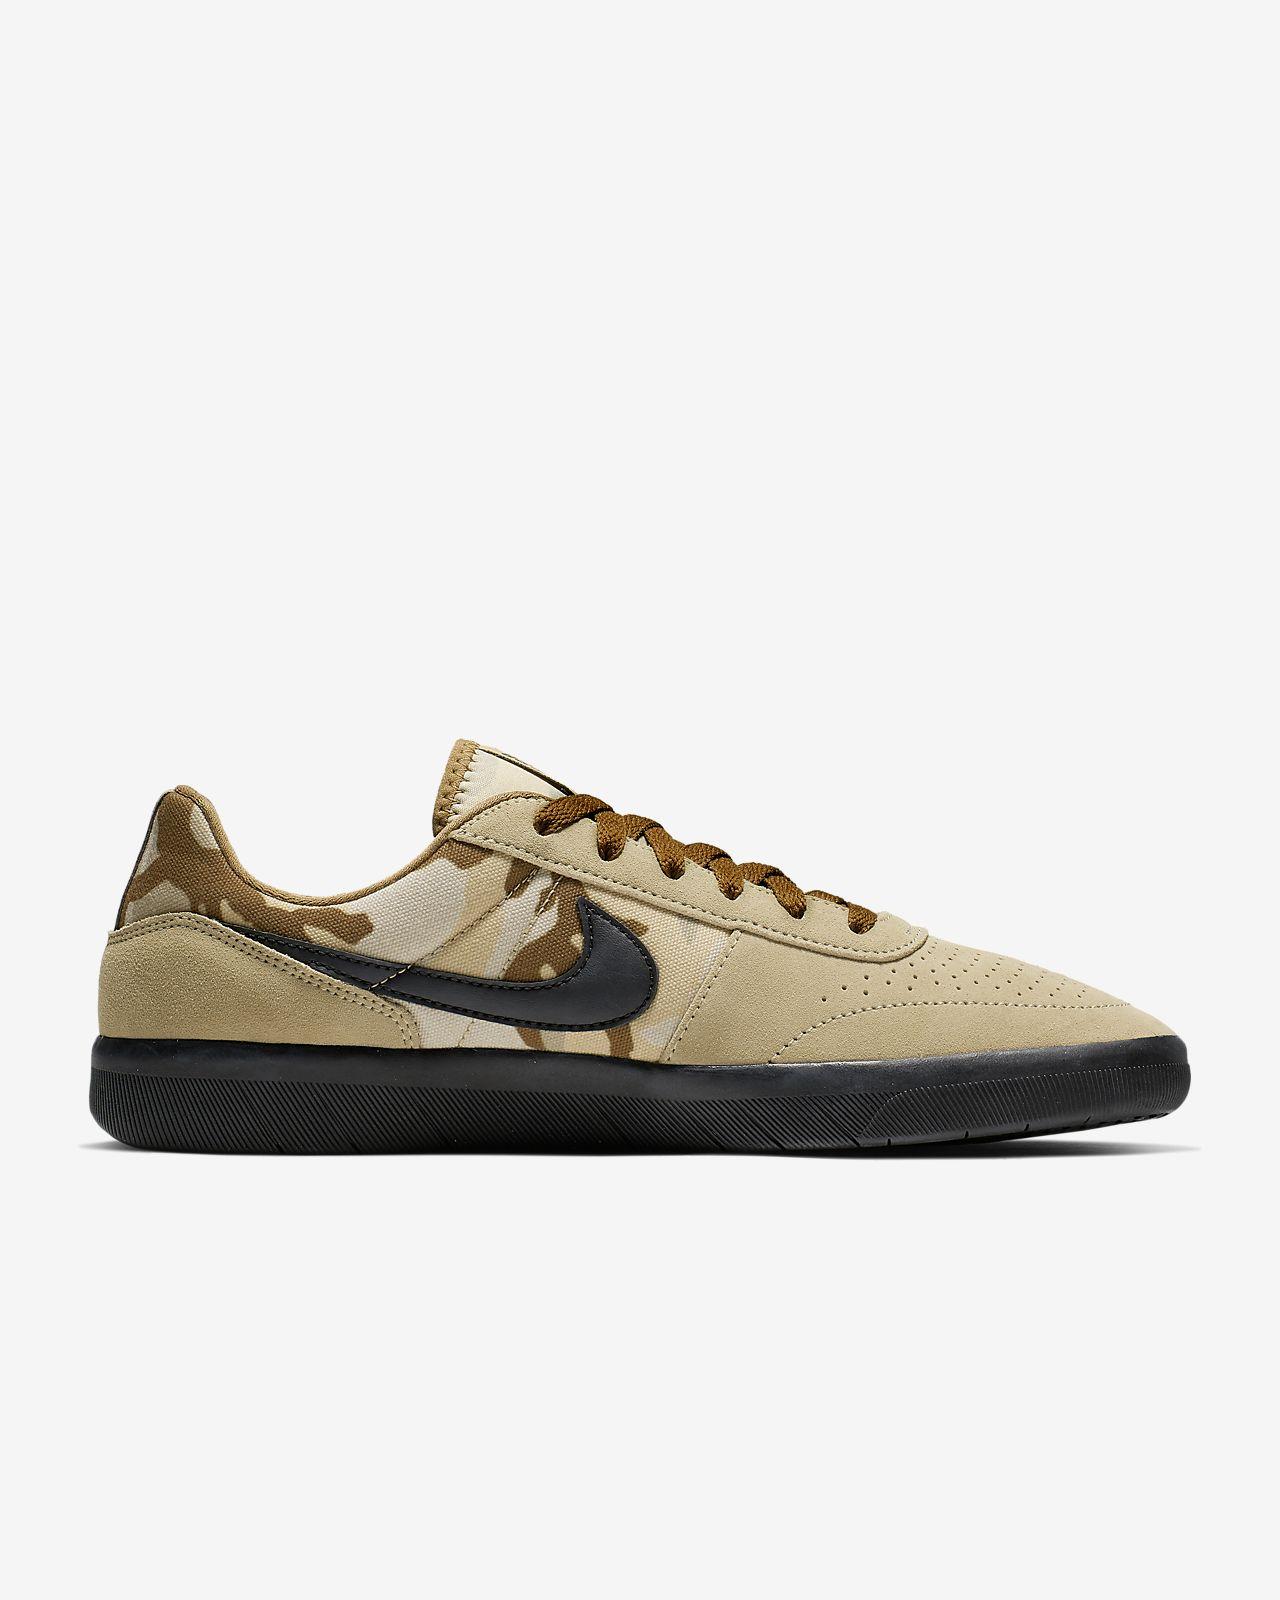 22079eee22d5 Nike SB Team Classic Men s Skate Shoe. Nike.com